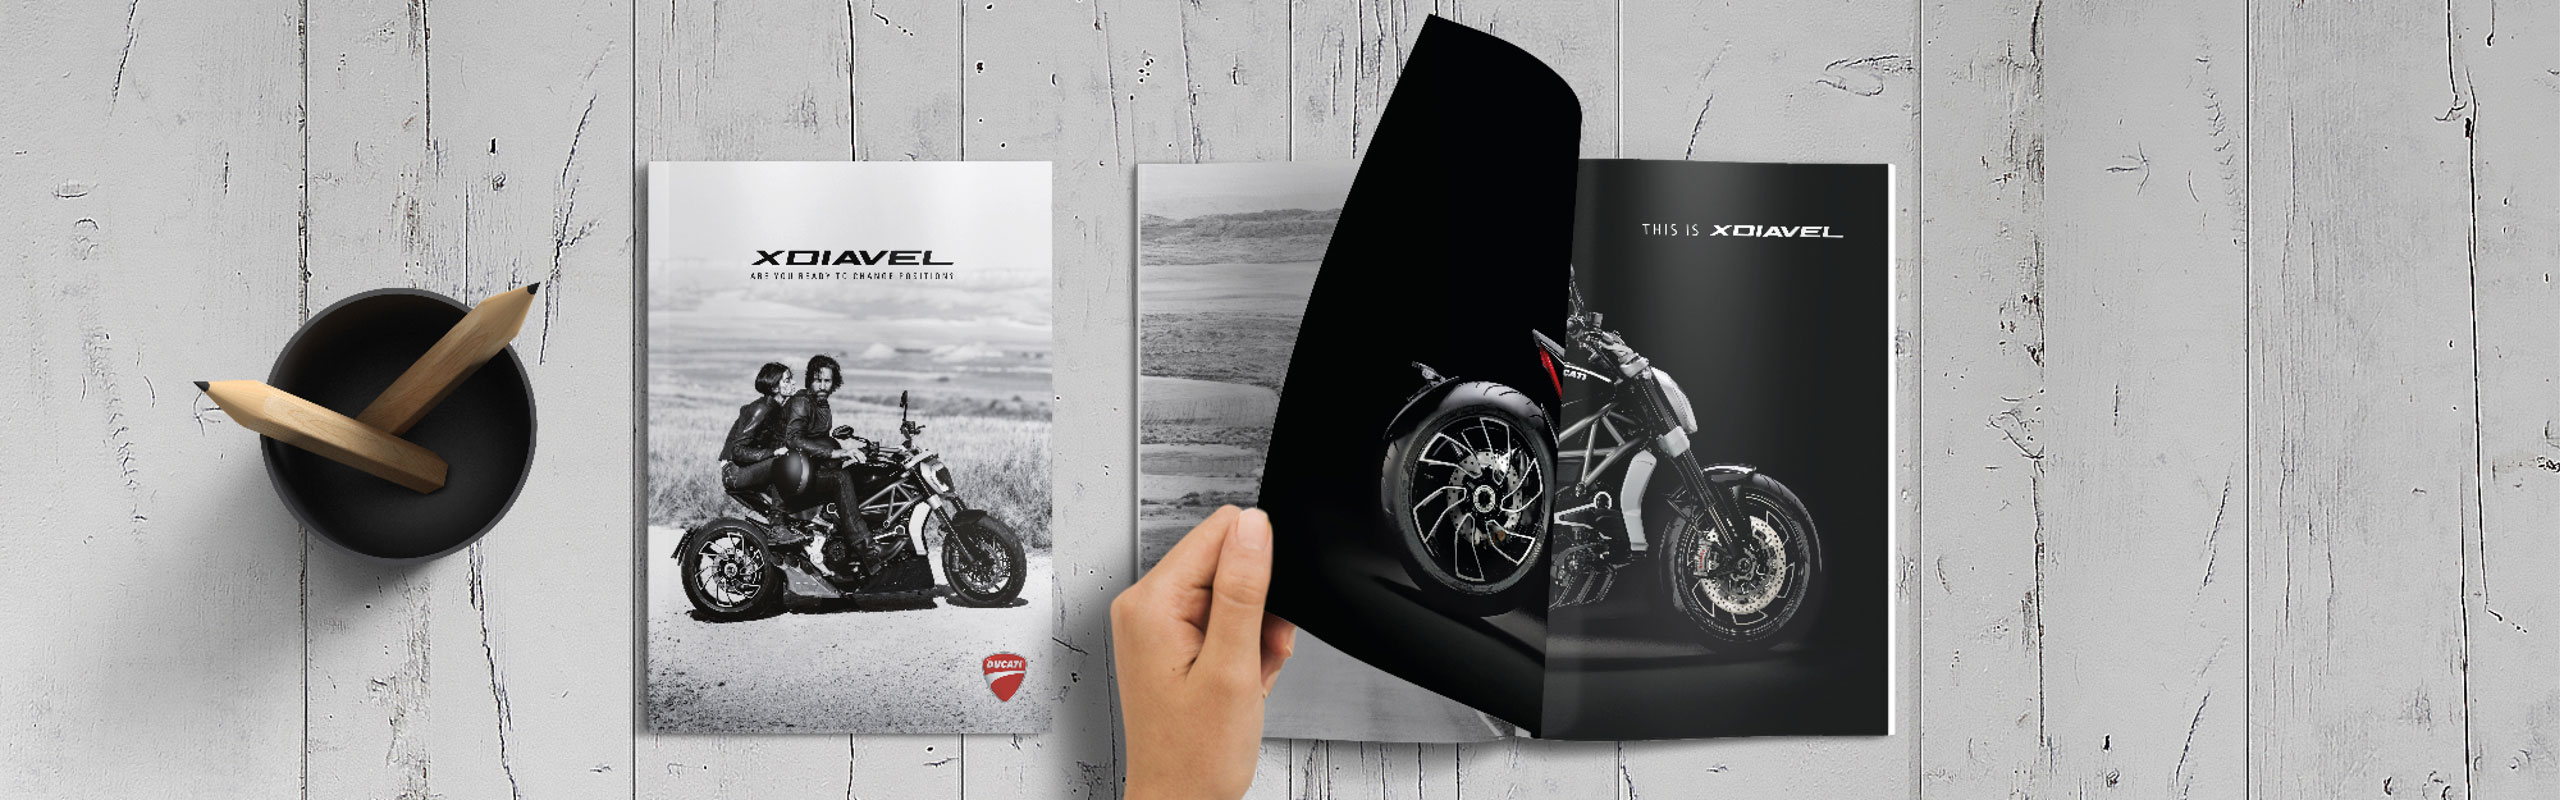 Ducati Brochure Xdiavel Likecube